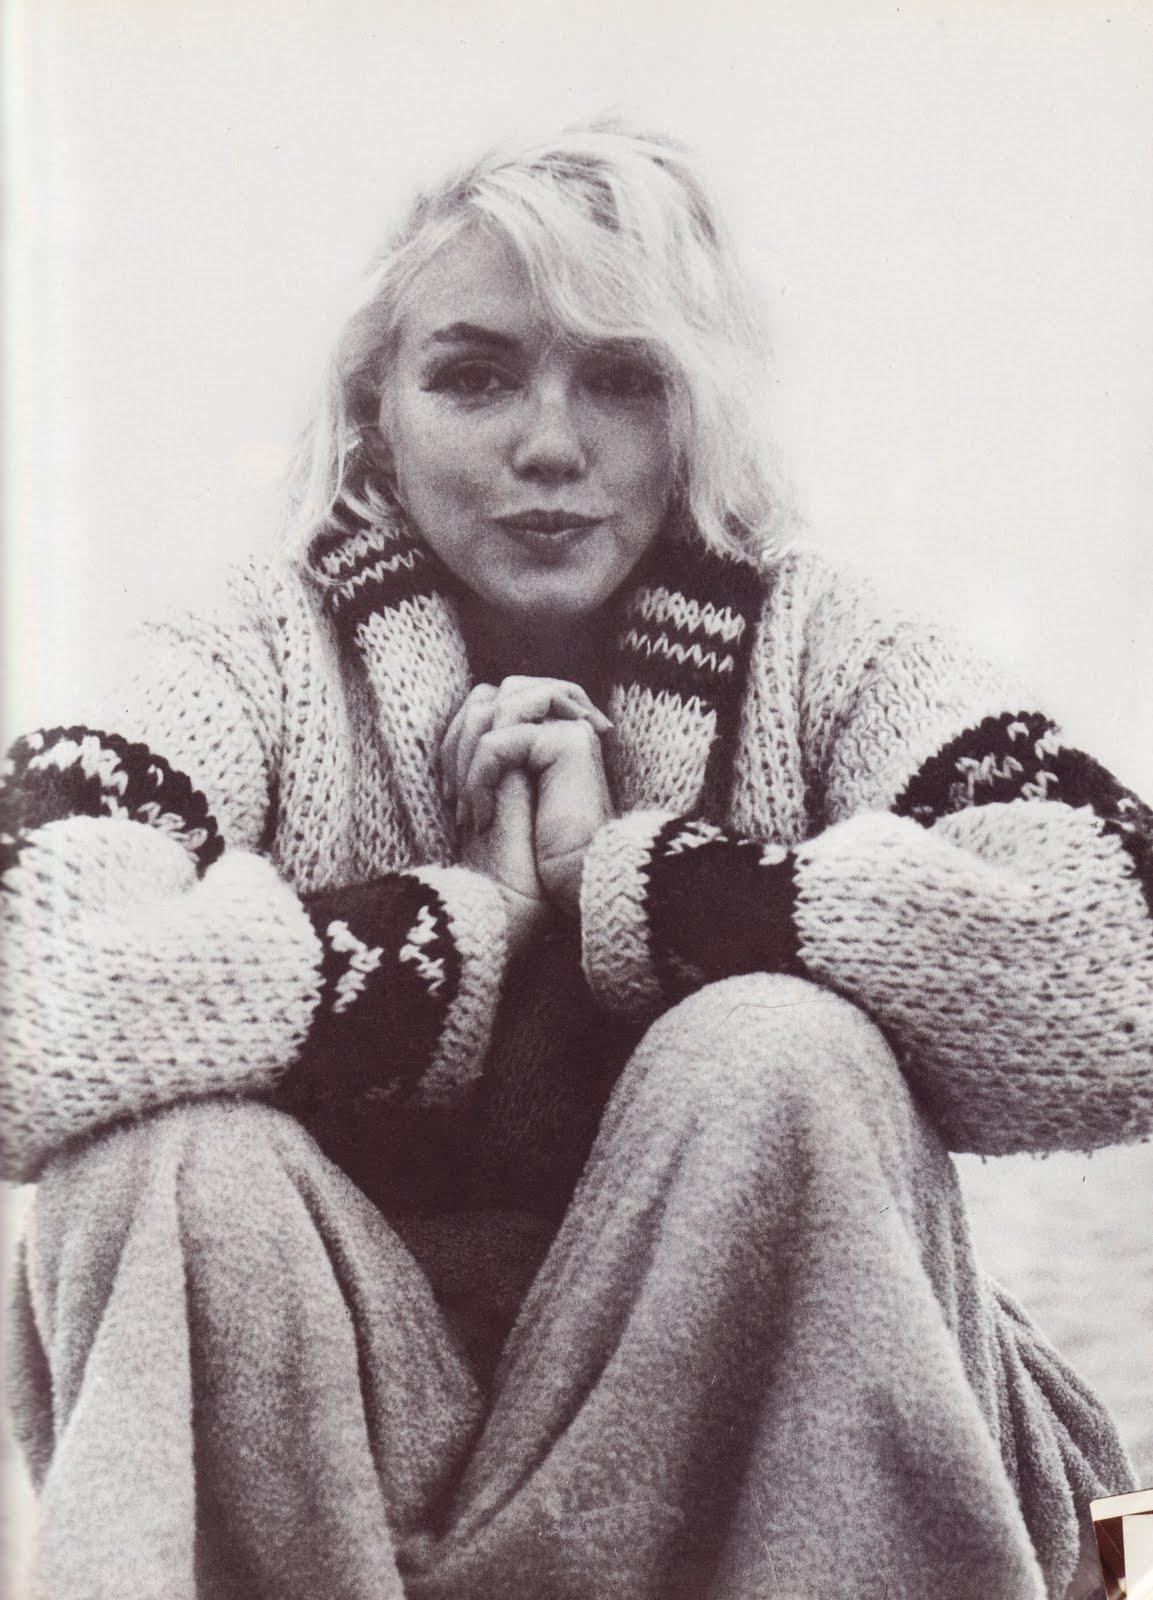 Marilyn Monroe Living Room Decor: Gracefully Searching: Marilyn Monroe & Kind Words